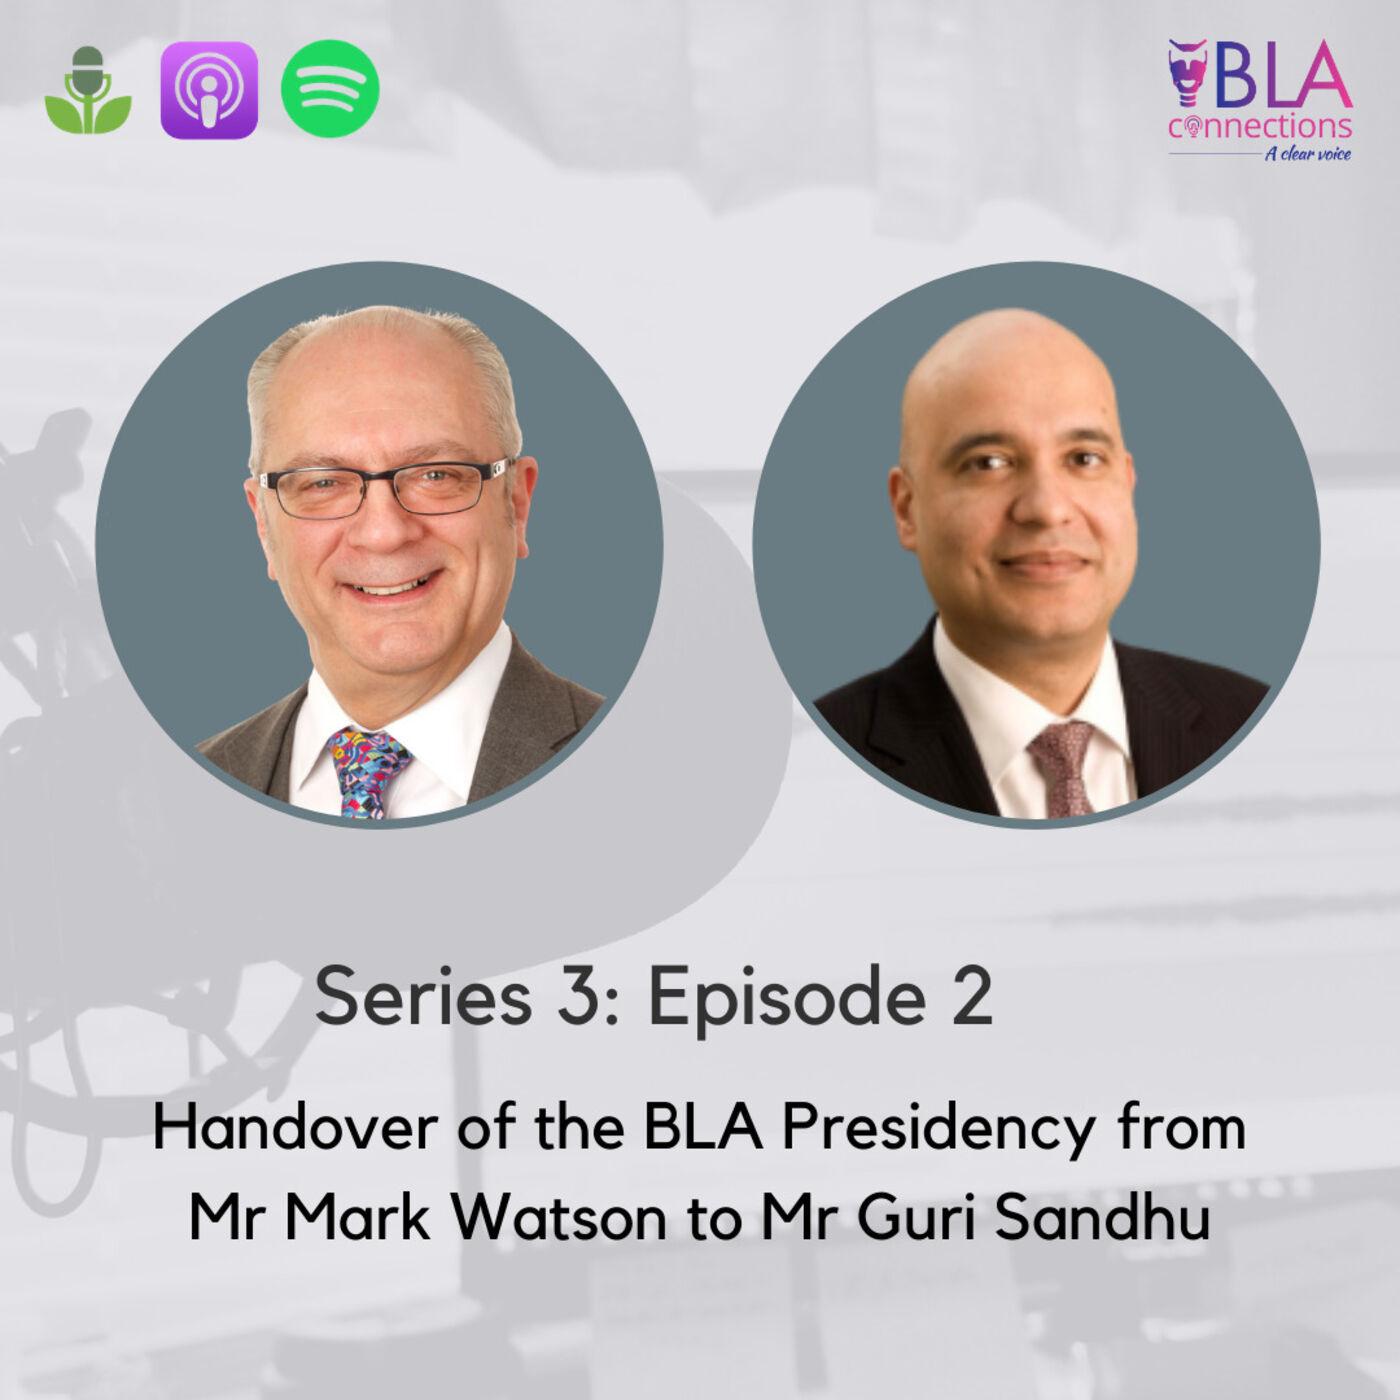 S3 Ep2: Handover of the BLA Presidency from Mr Mark Watson to Mr Guri Sandhu